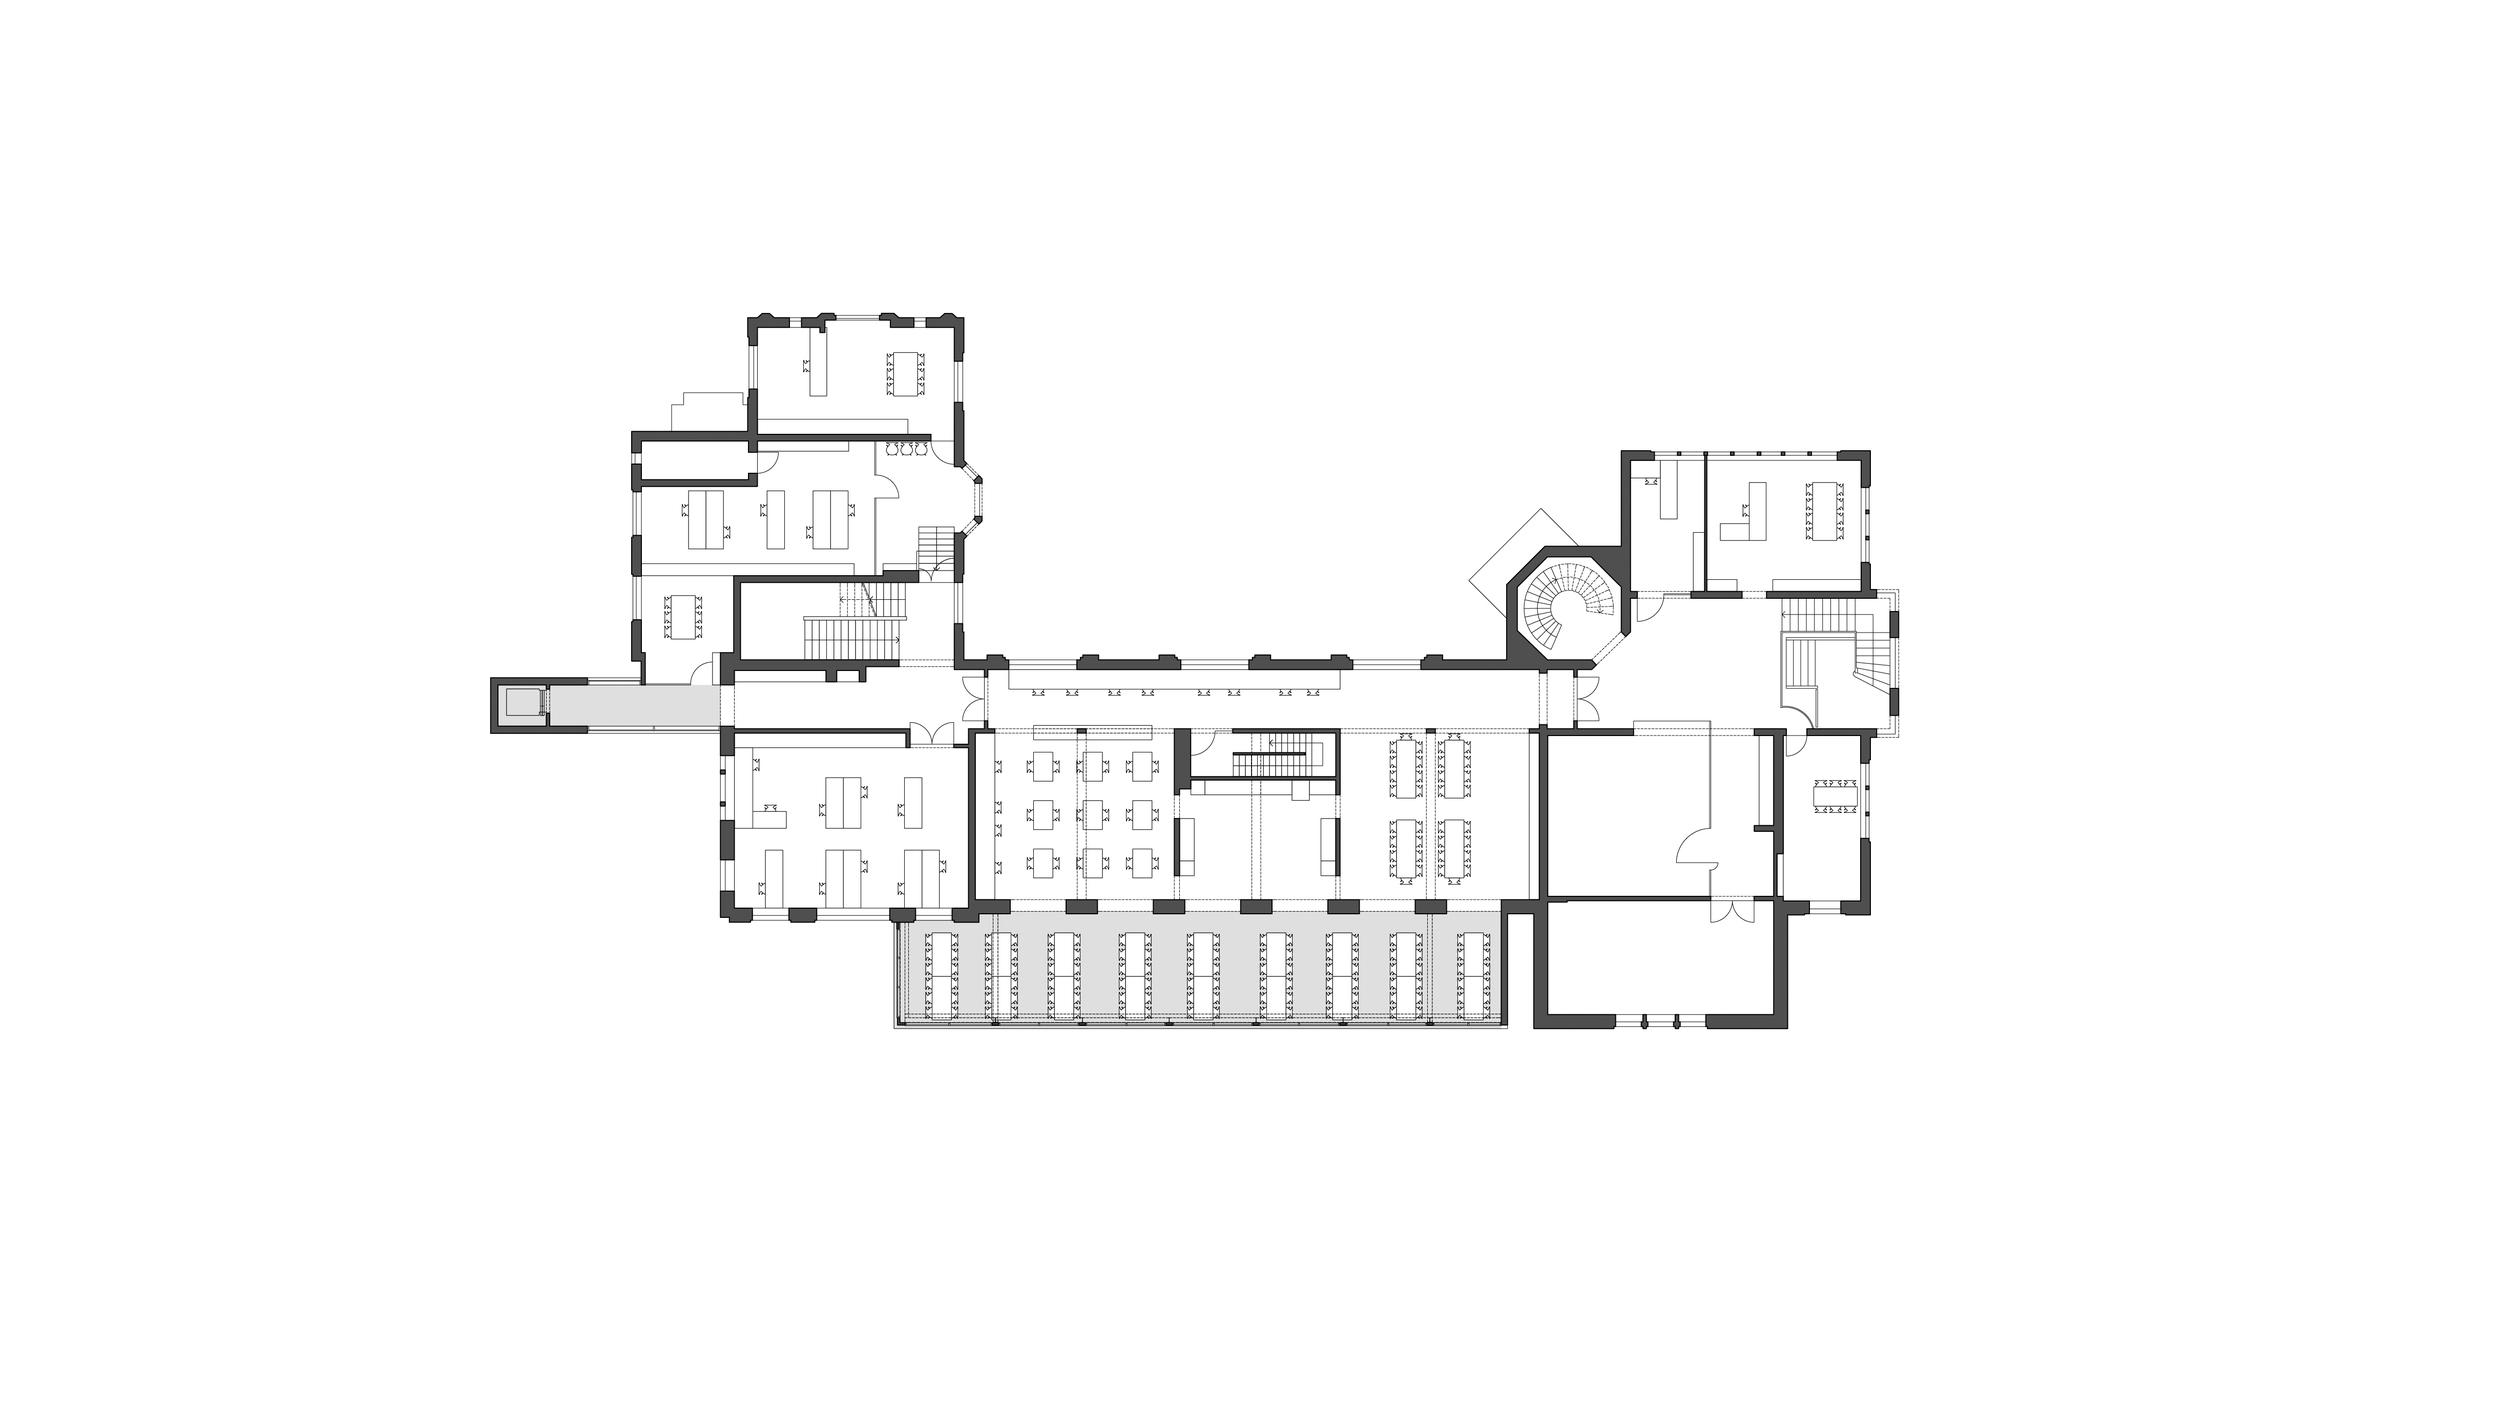 4 3 4 PITO hoofdgebouw plan.jpg